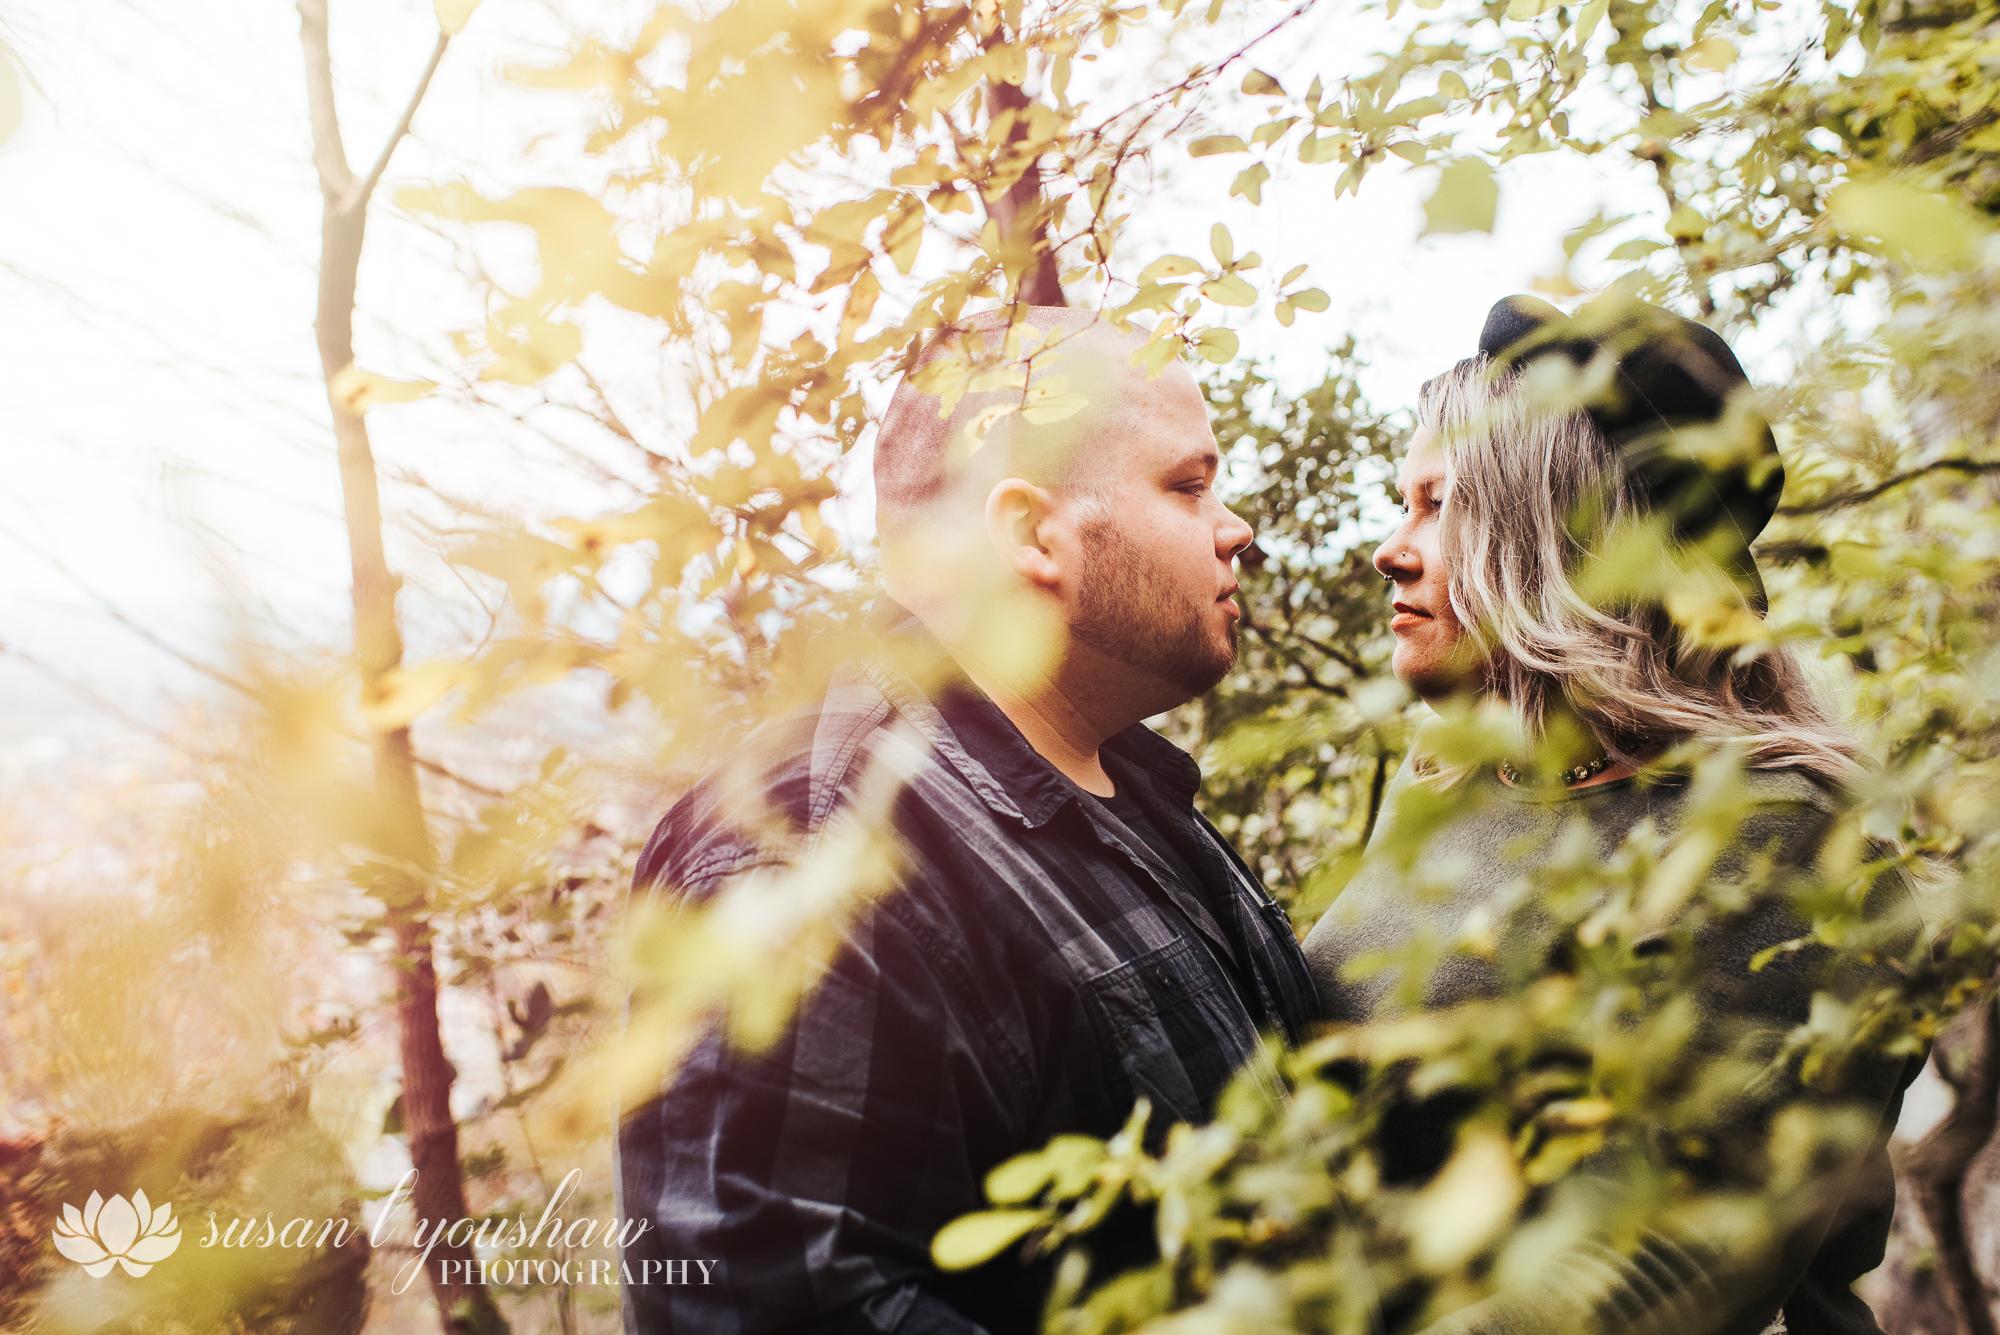 BLOG Heather 09-23-2018 SLY photography LLC-2.jpg